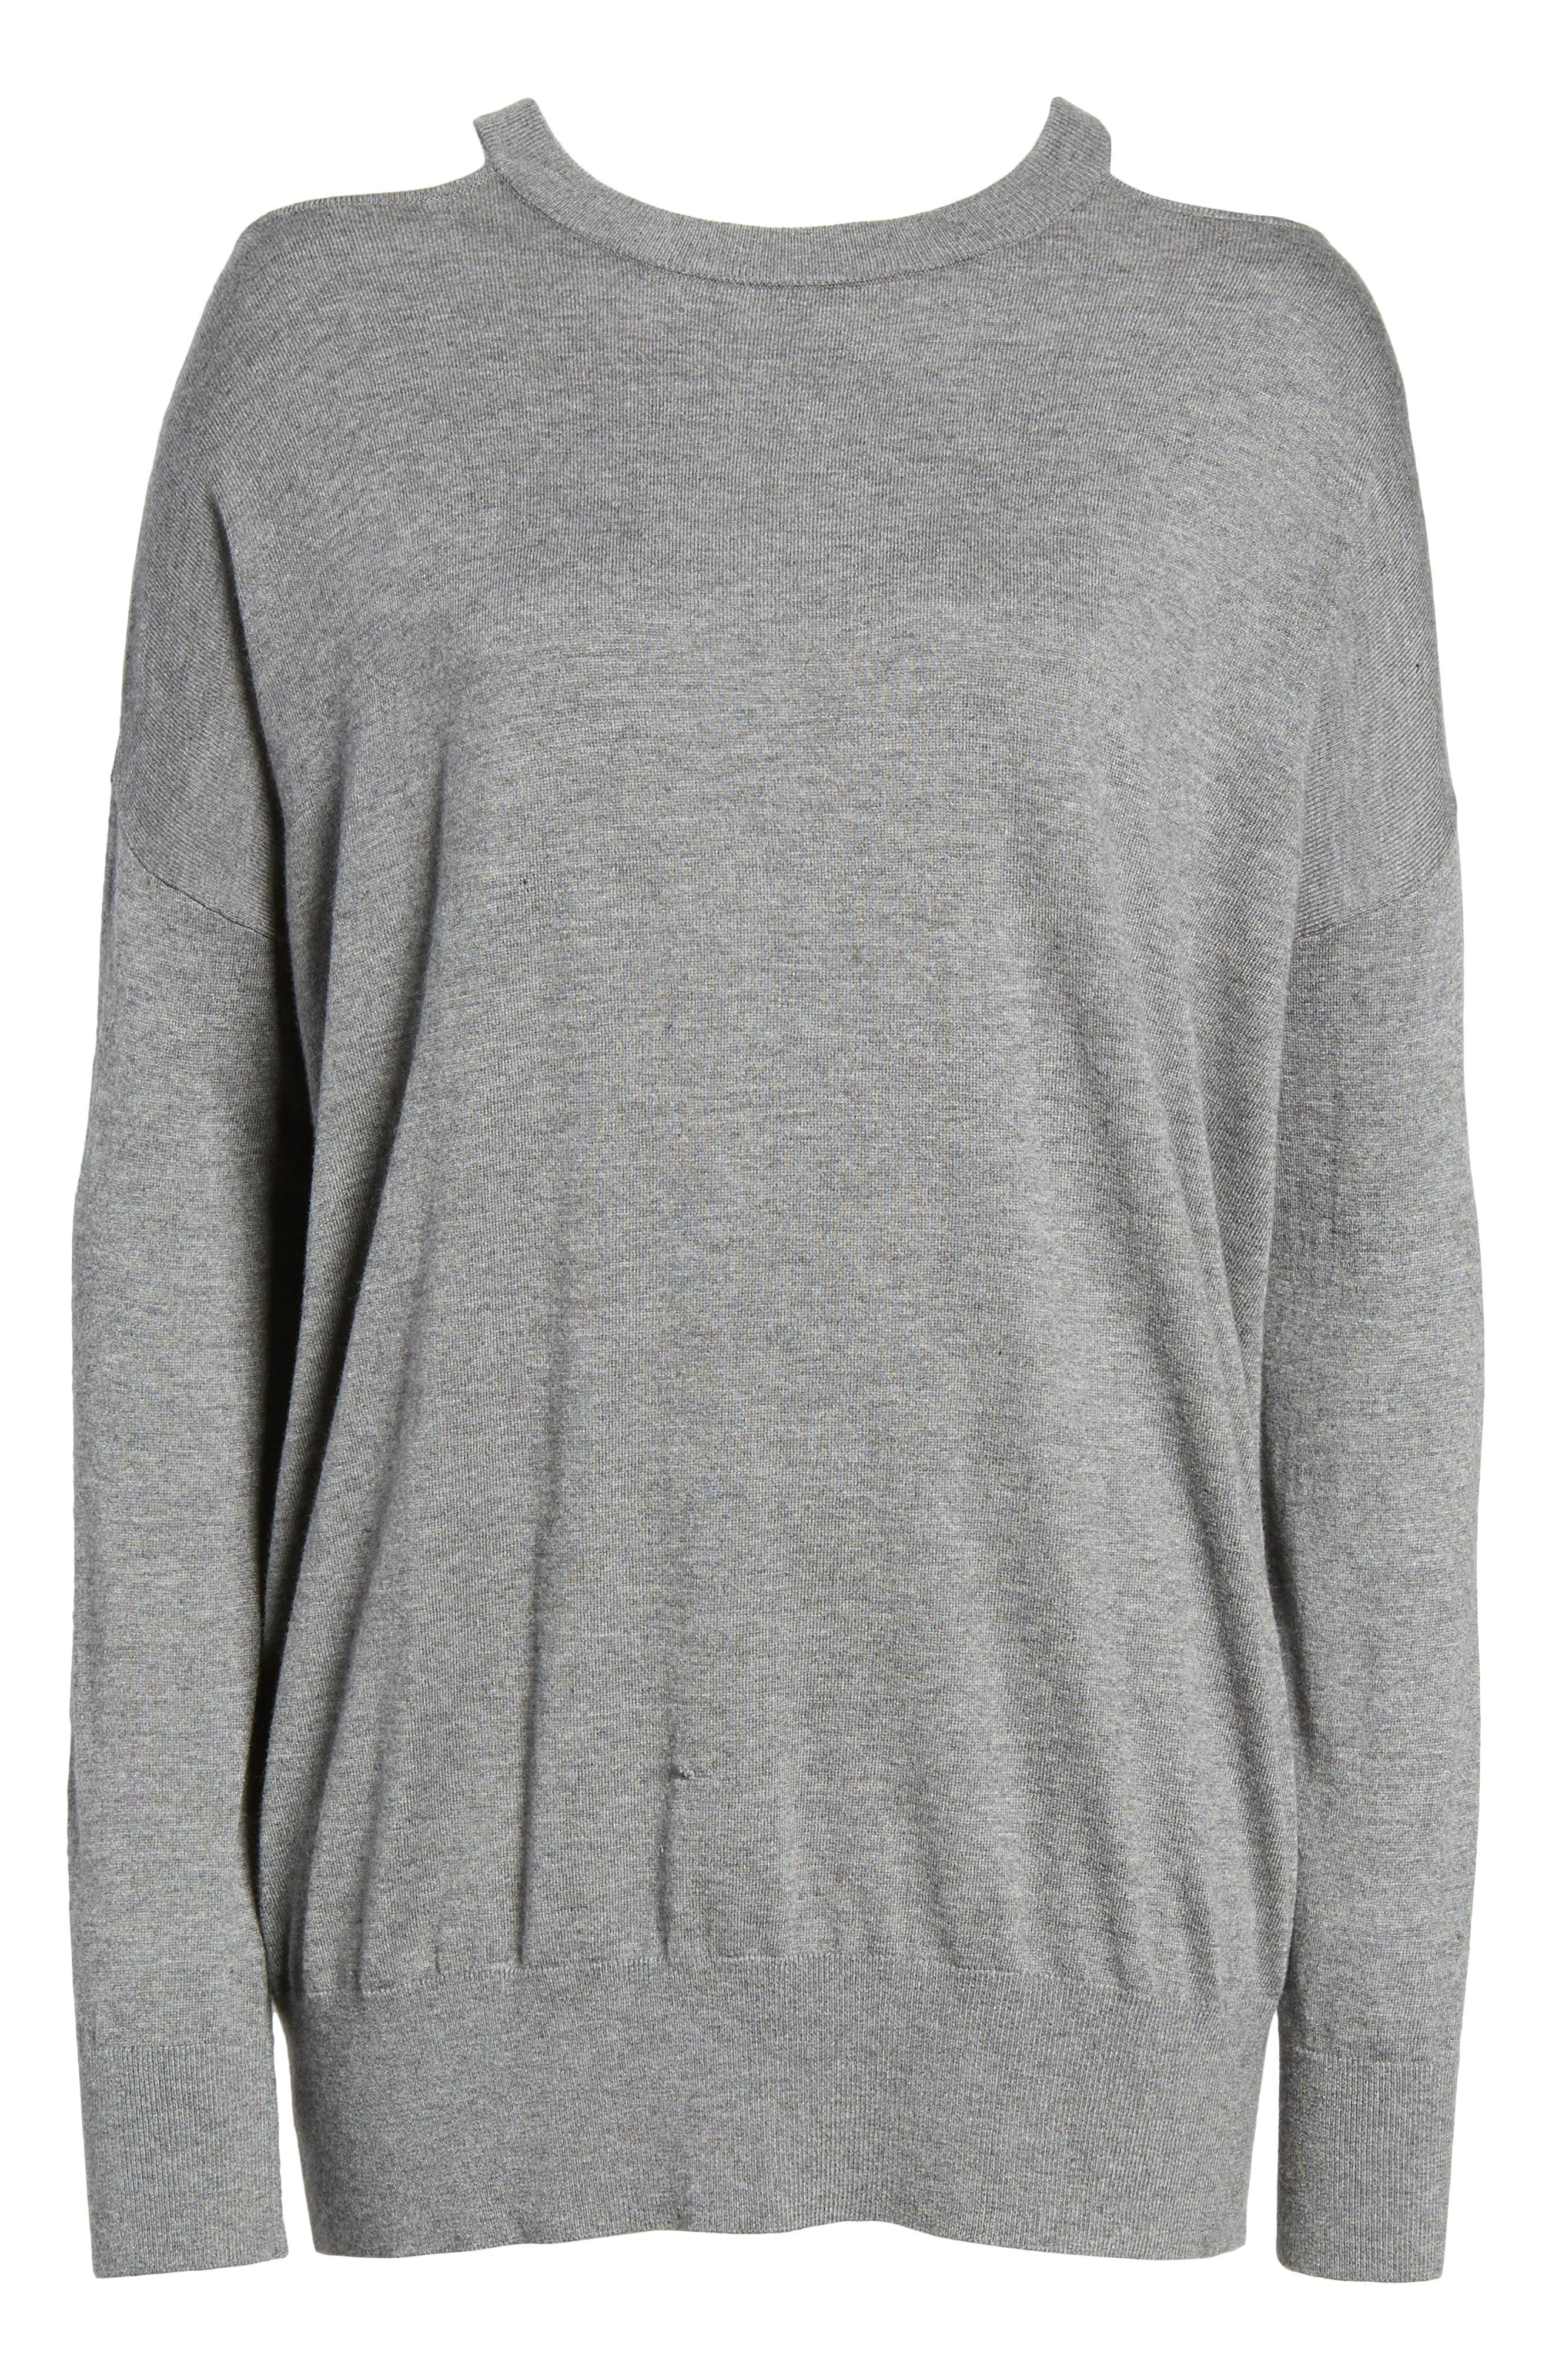 Canarise Cutout Sweater,                             Alternate thumbnail 6, color,                             Heather Cinder